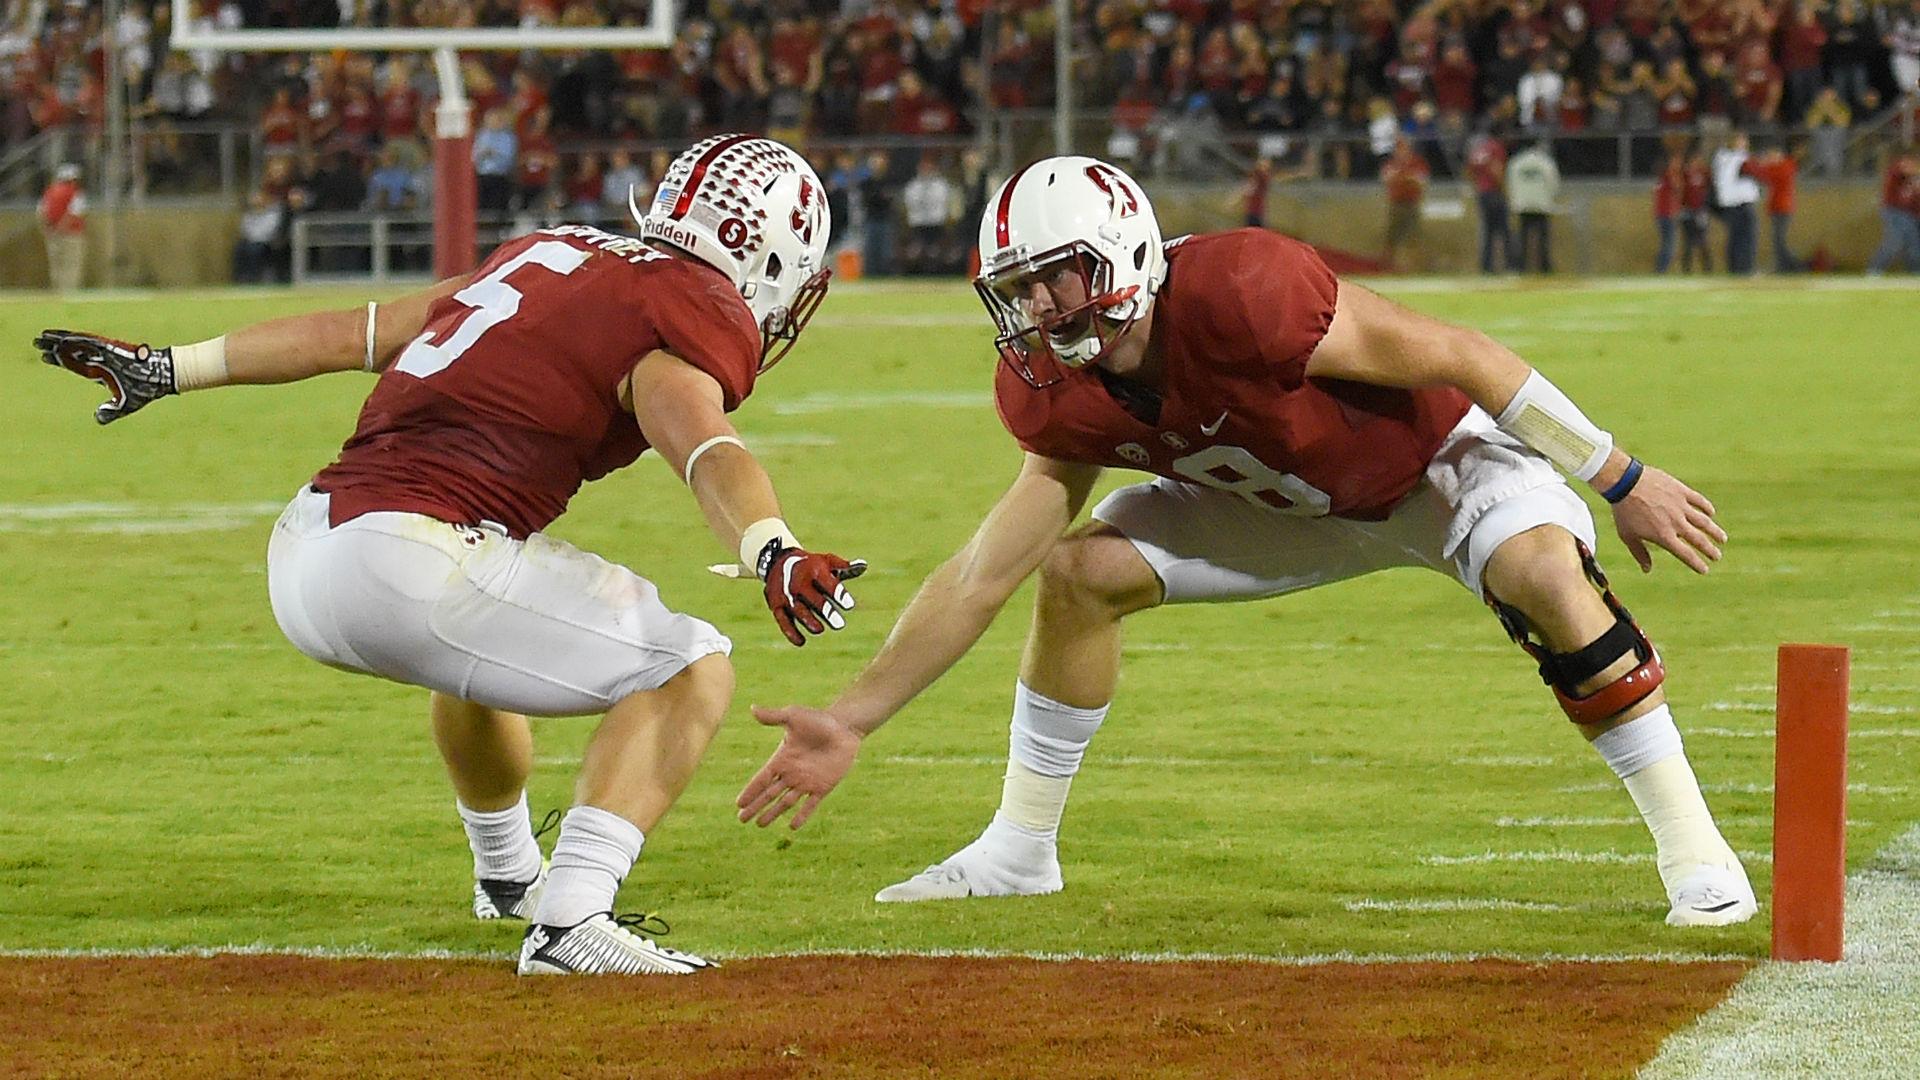 Notre Dame vs. Stanford pick from Reno – Banged-up Irish visit physical Cardinal